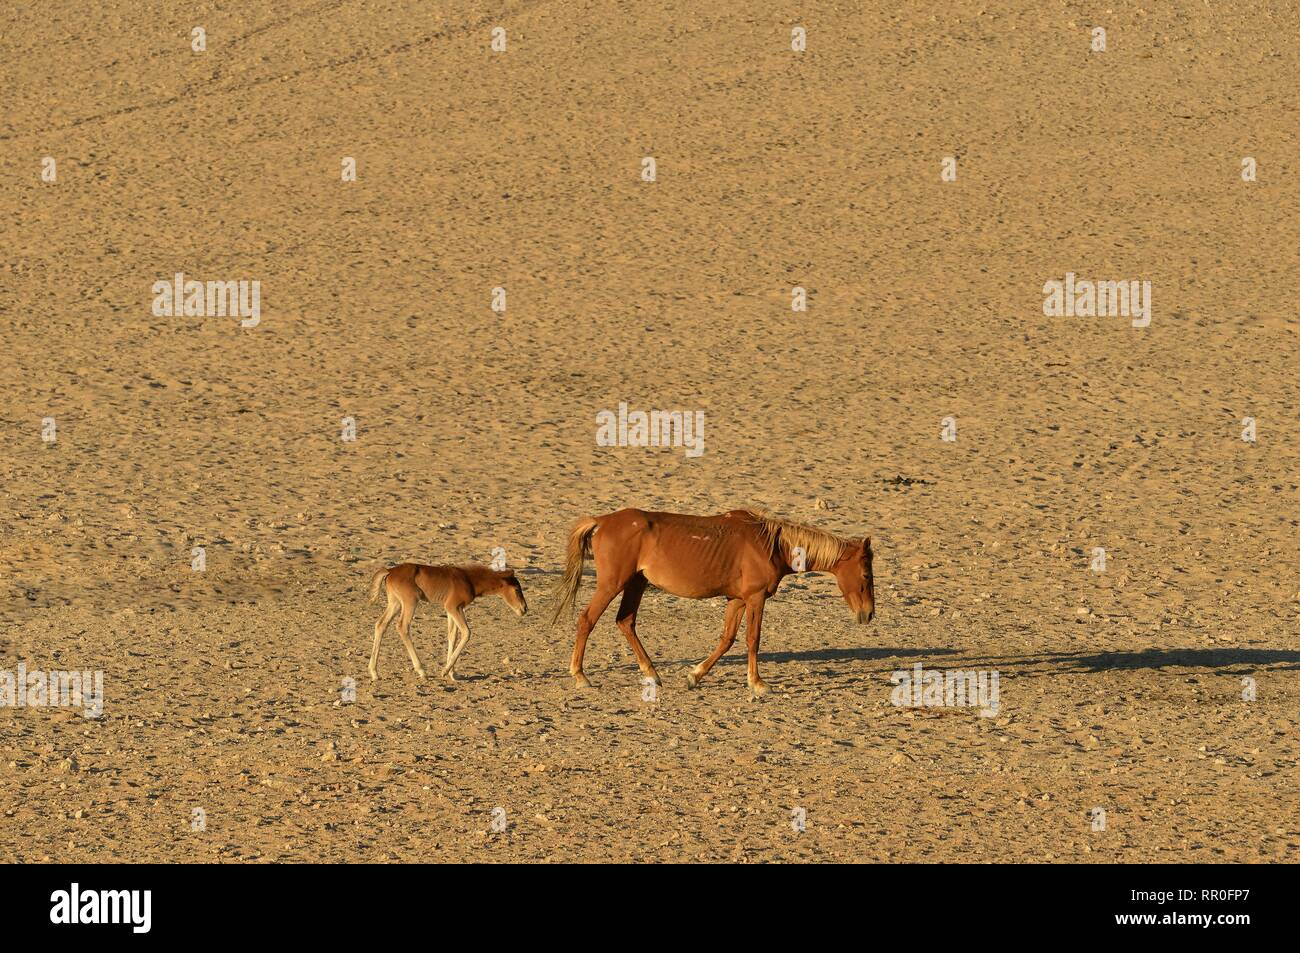 zoology, mammal (mammalia), Namib Desert horse, Namibian wild horse or Namib (Equus ferus) near of the, Additional-Rights-Clearance-Info-Not-Available - Stock Image